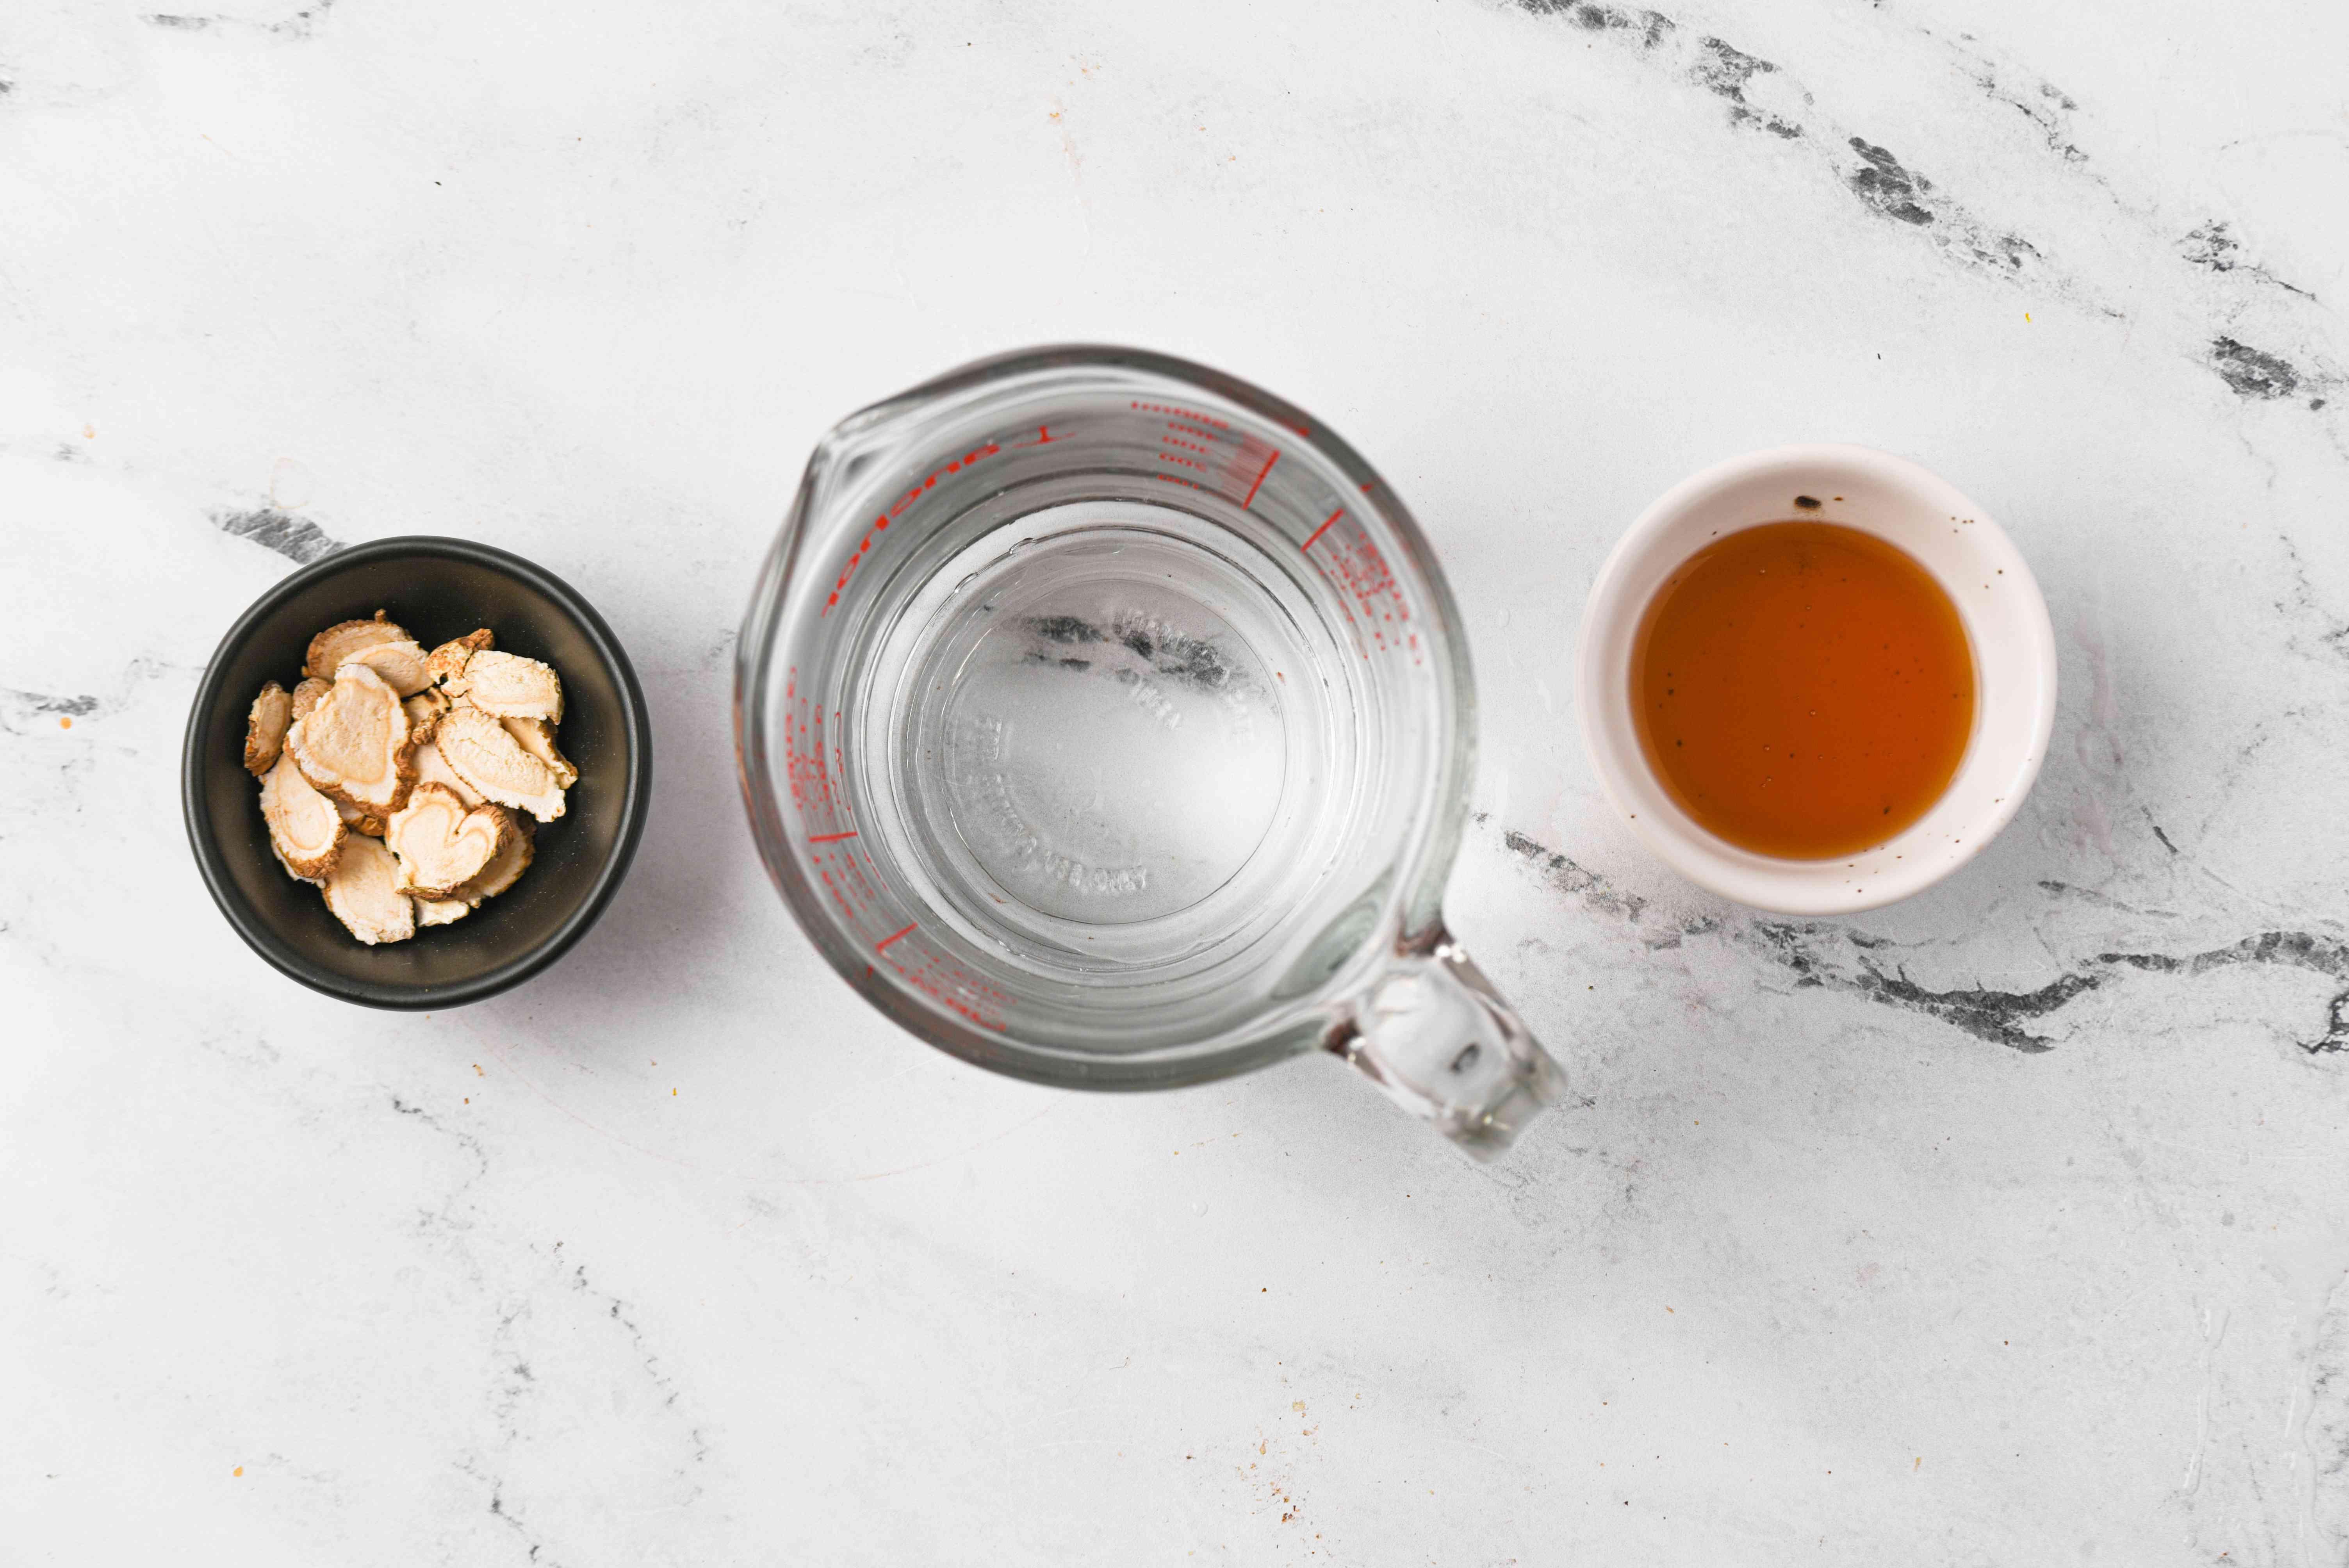 Korean Ginseng Tea (Insam Cha) ingredients